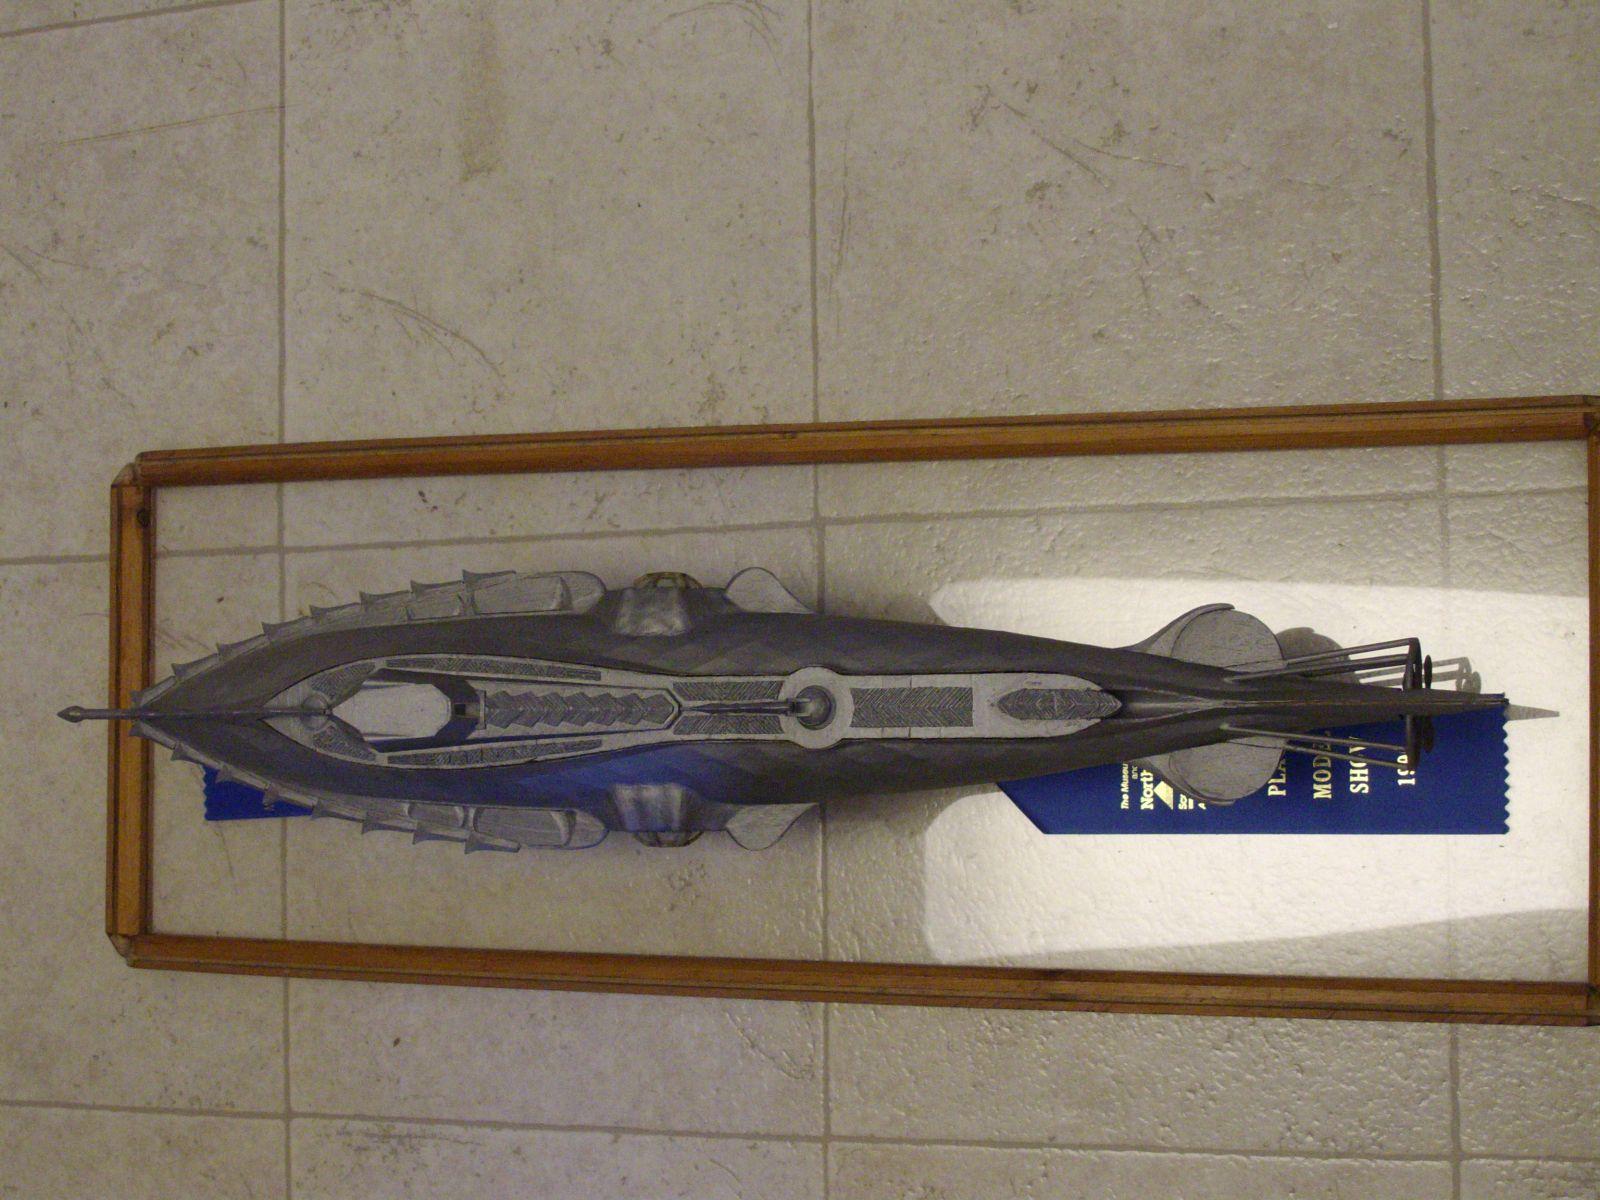 Disney Nautilus submarine